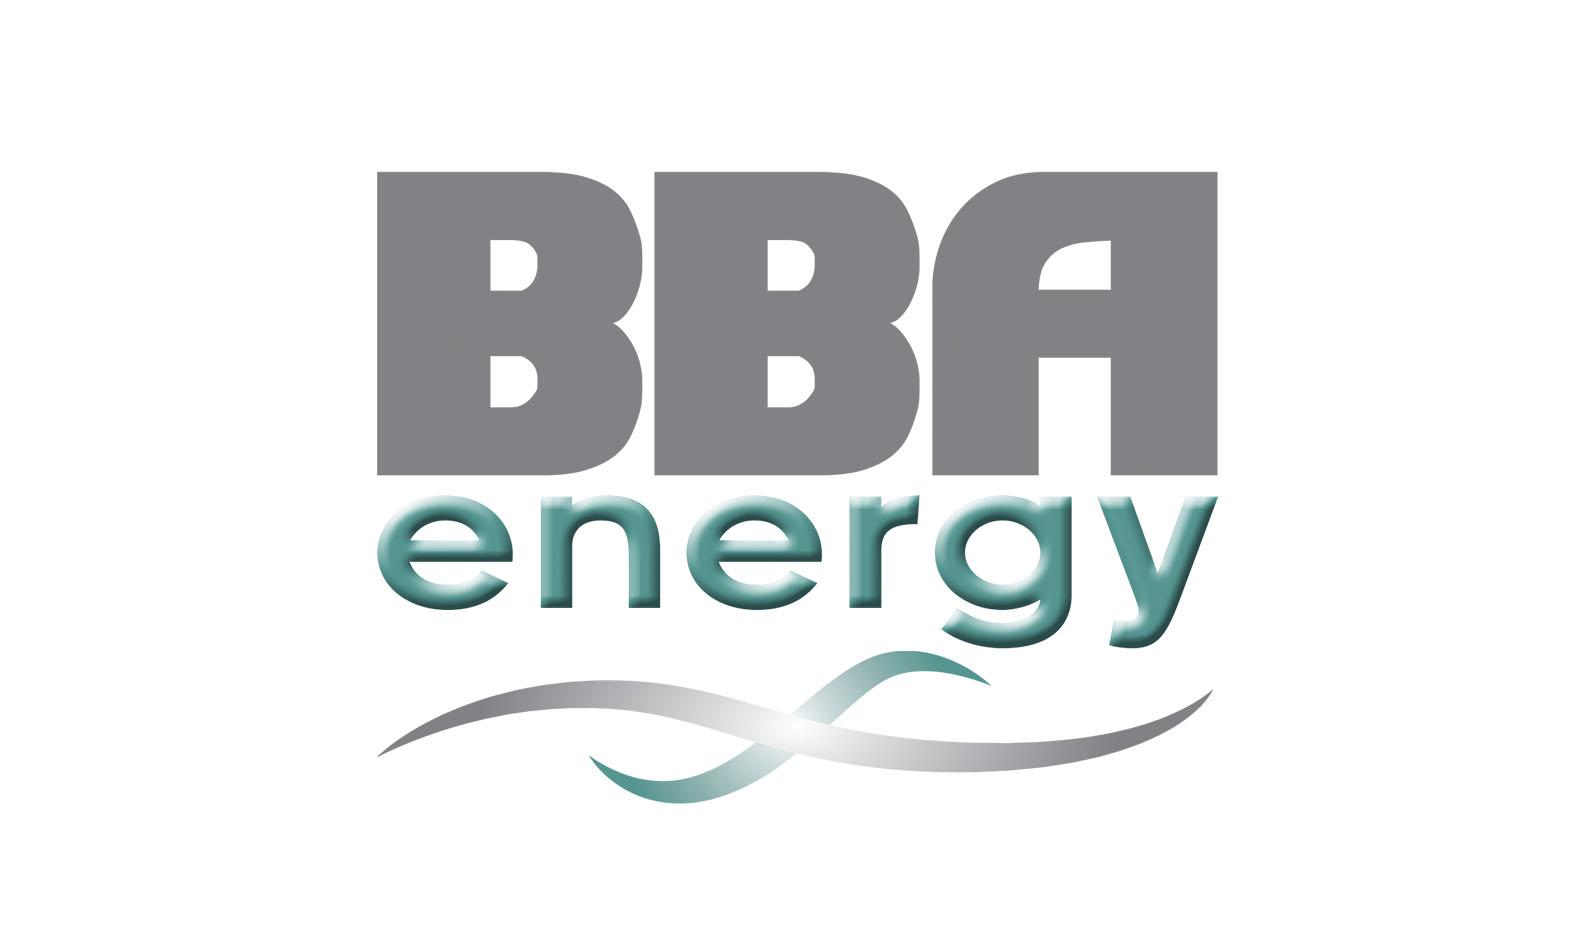 BBA Energy logo